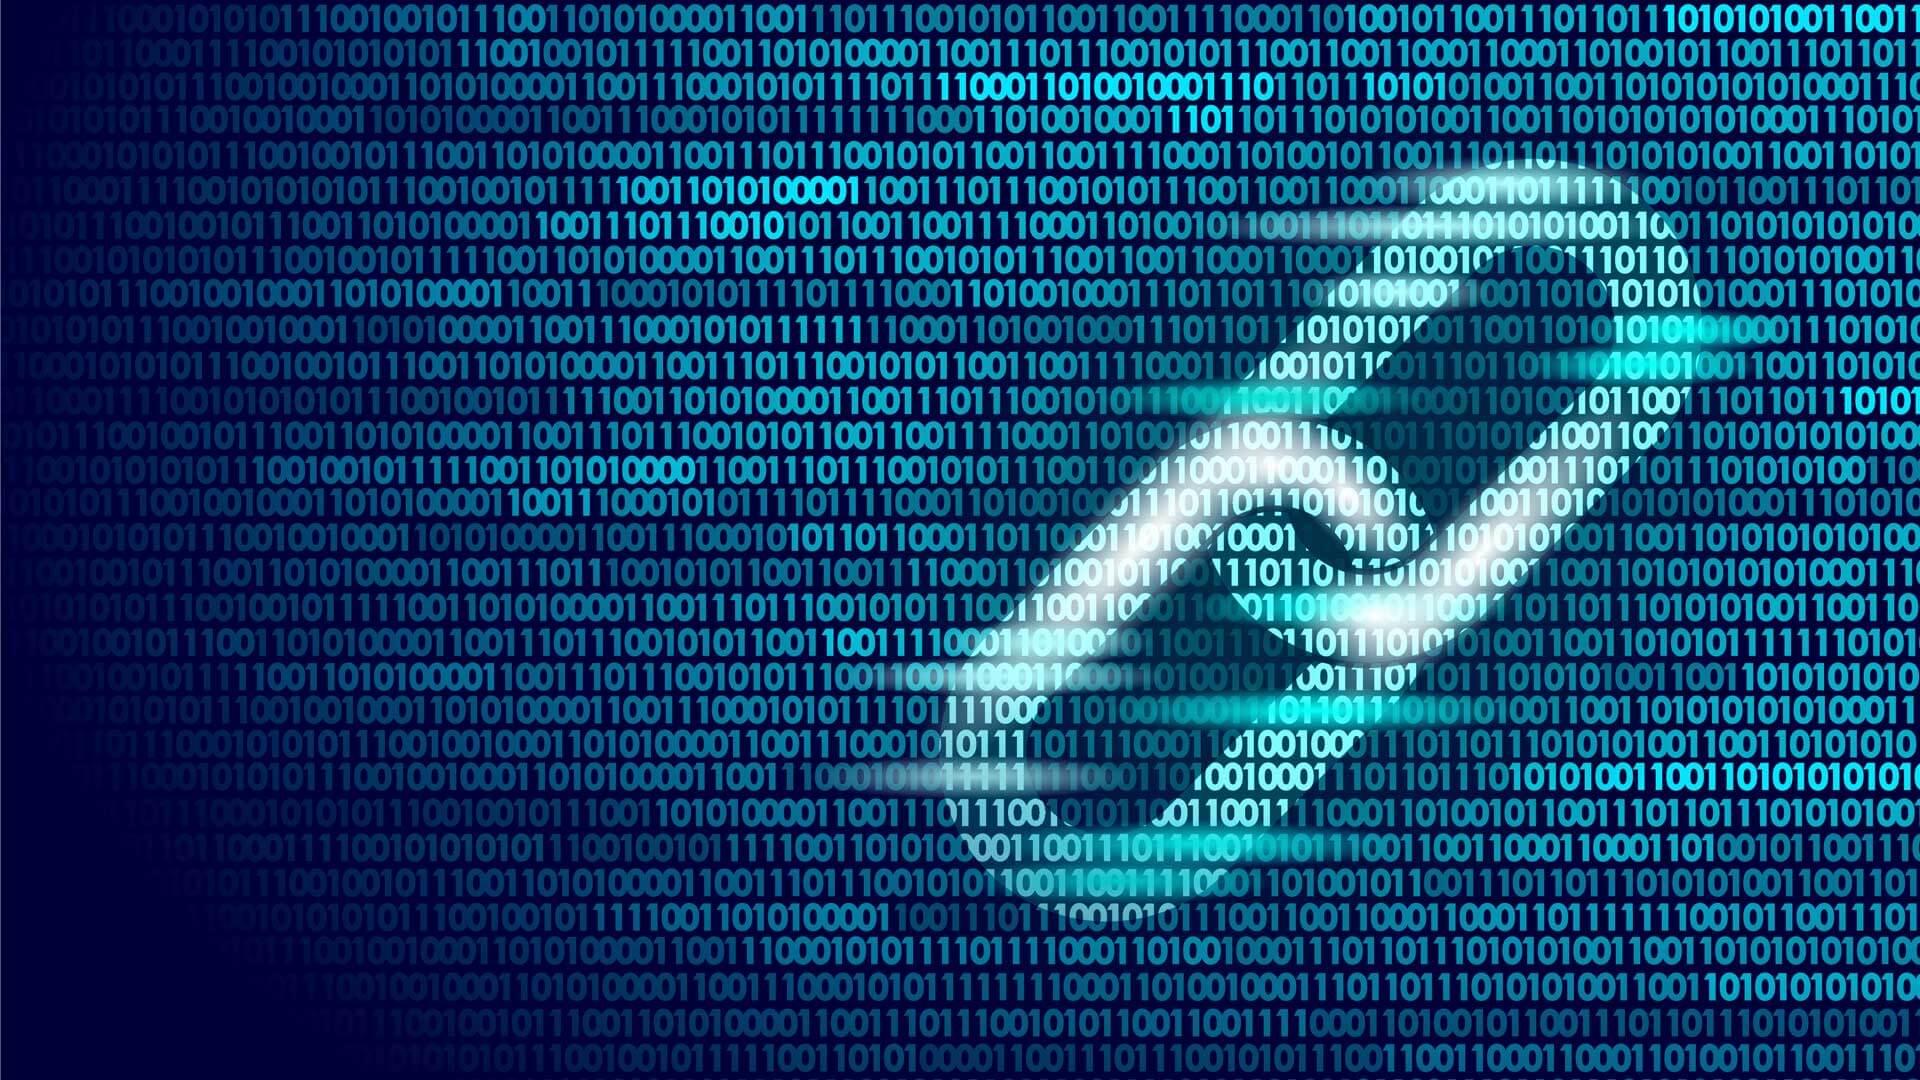 Blockchain – The Future of Business